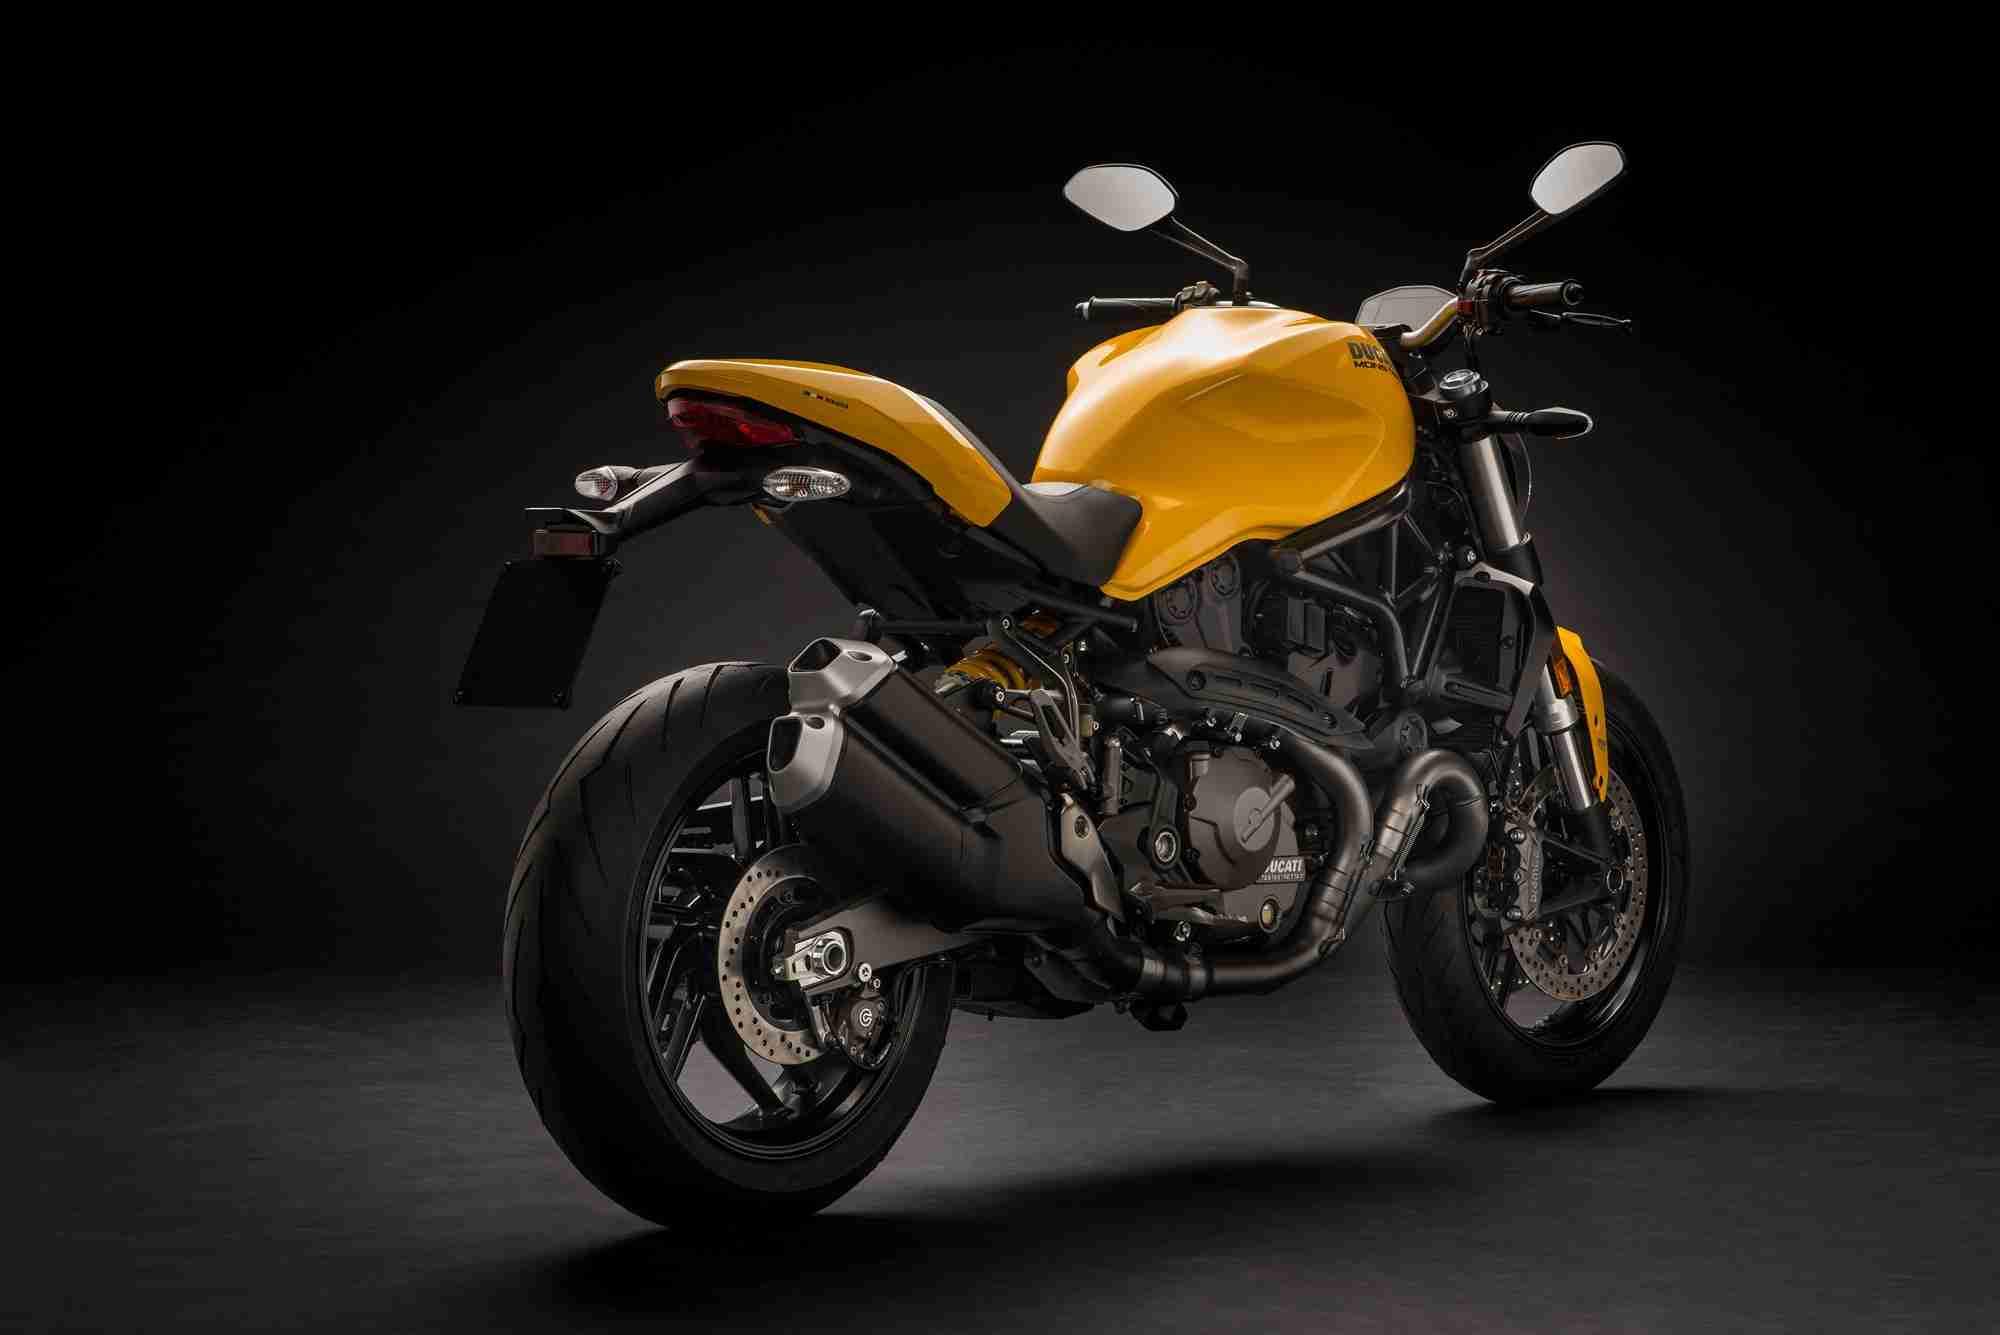 2018 Ducati Monster 821 goes yellow